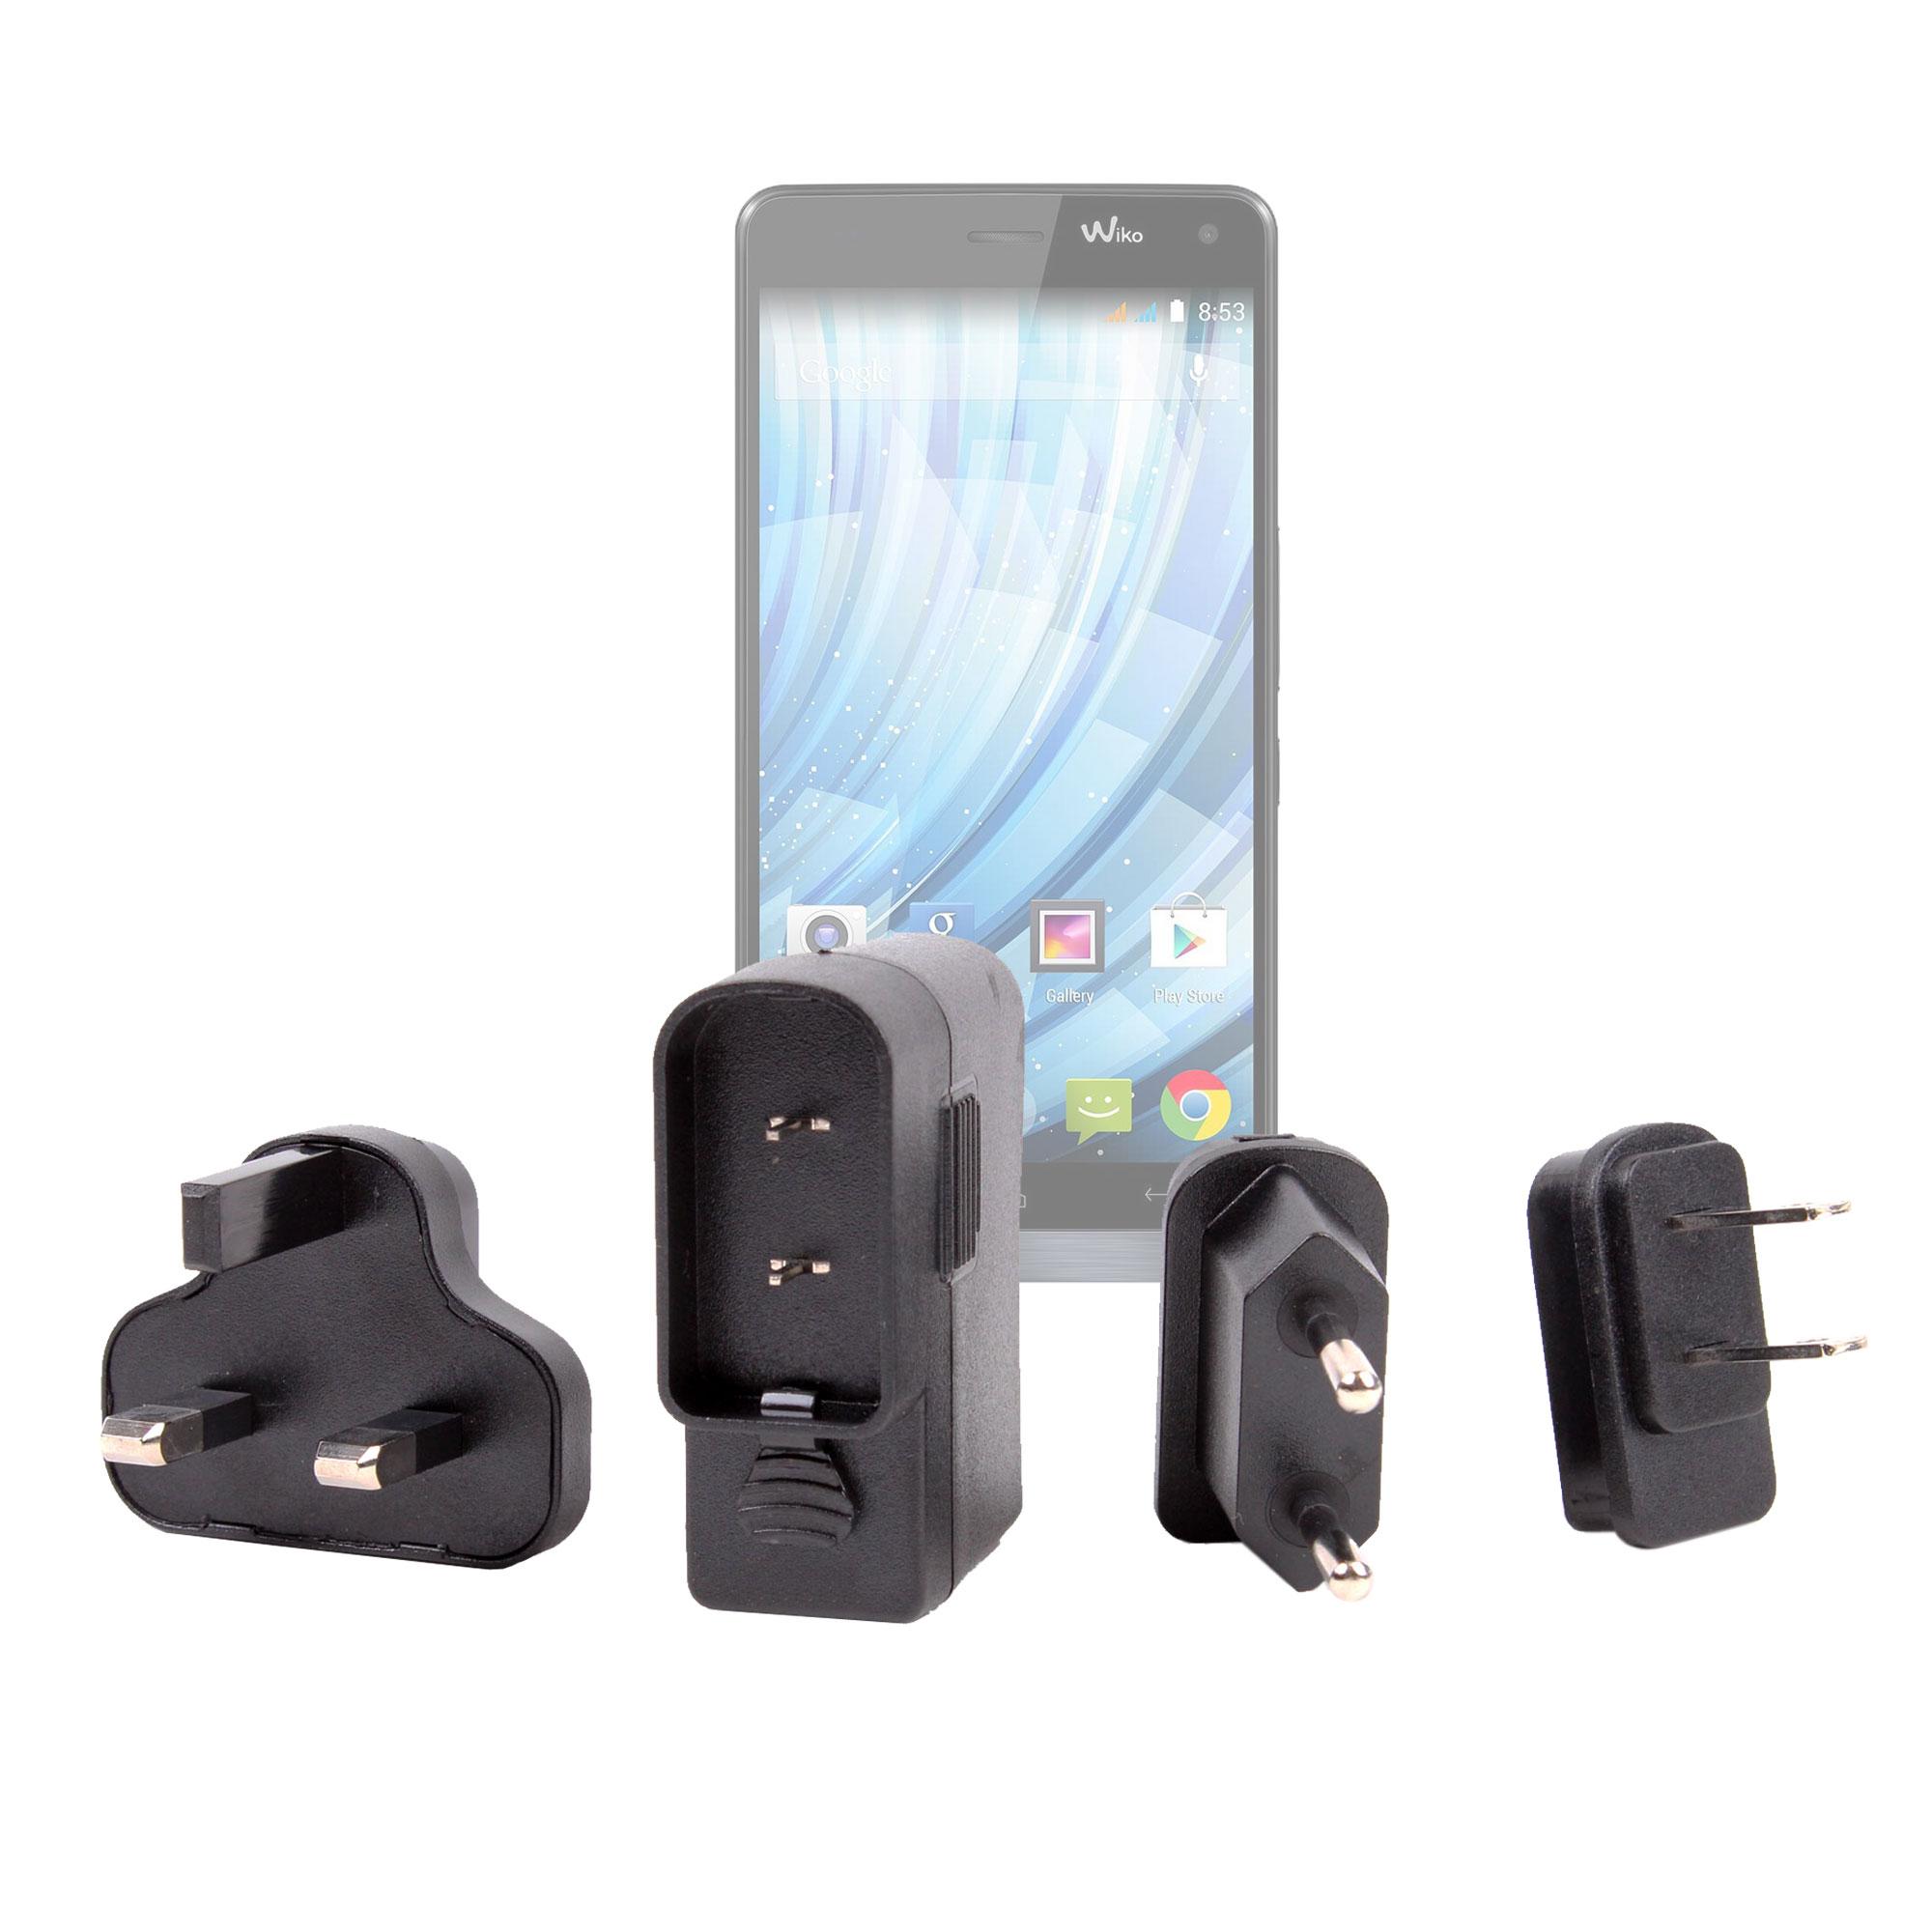 chargeur adaptateurs monde pour smartphone wiko getaway. Black Bedroom Furniture Sets. Home Design Ideas